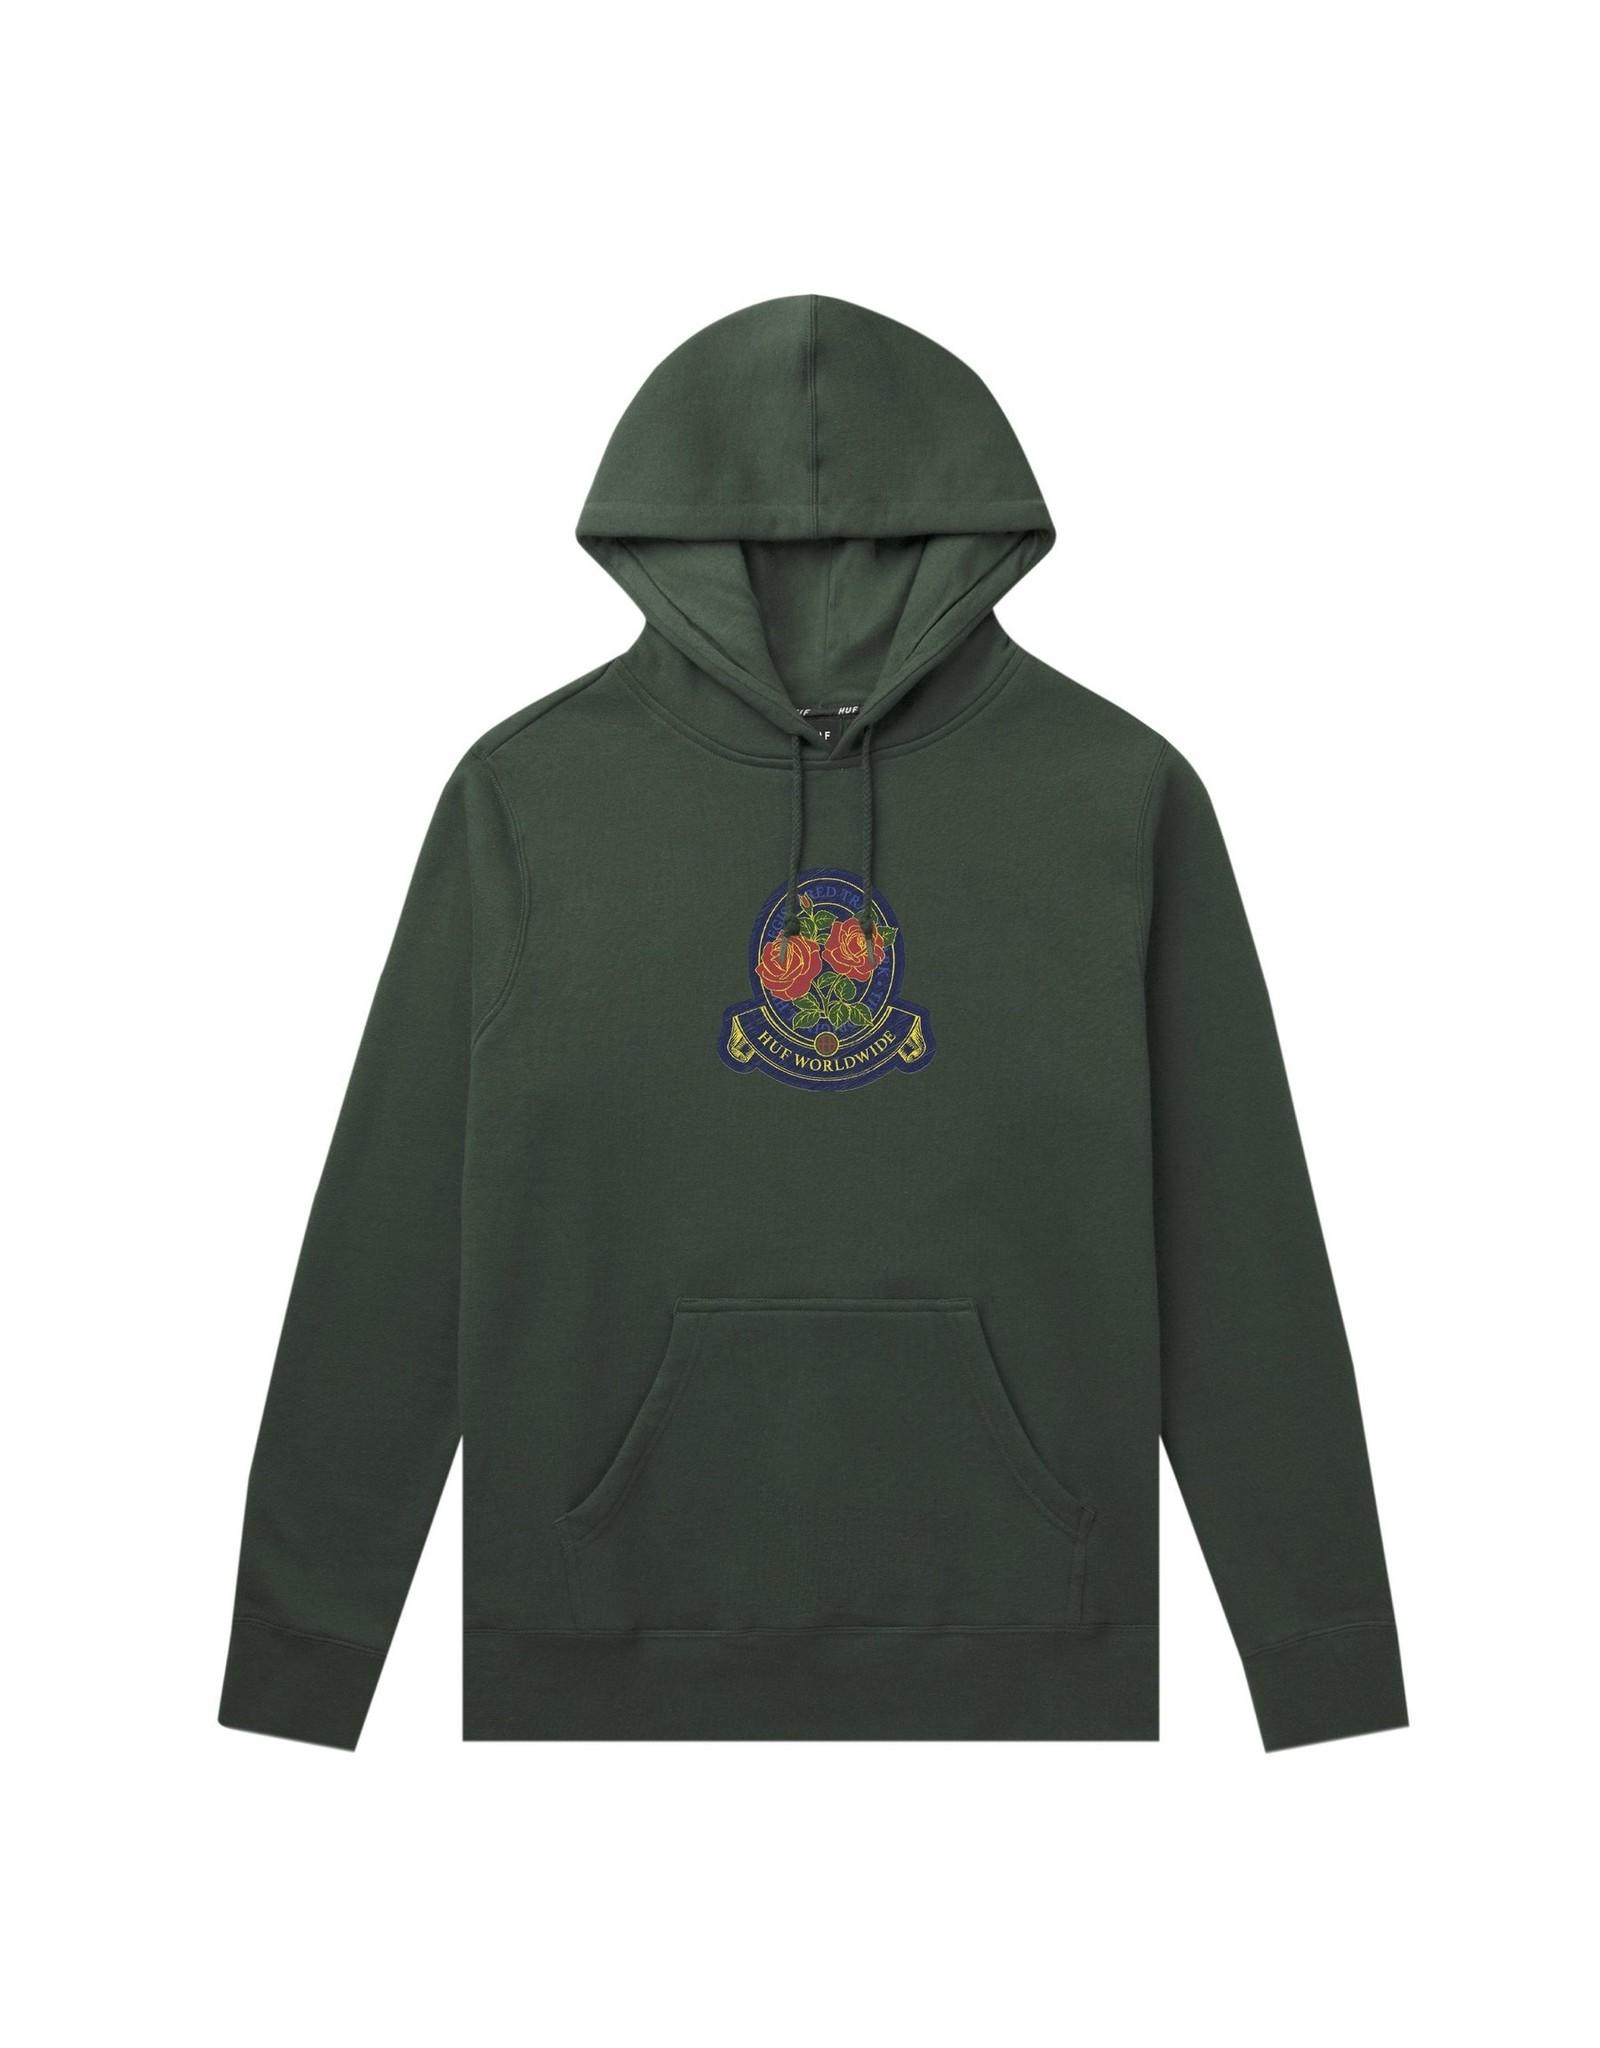 HUF Huf Tenderloin Rose Crest P/O Hoodie - Sycamore